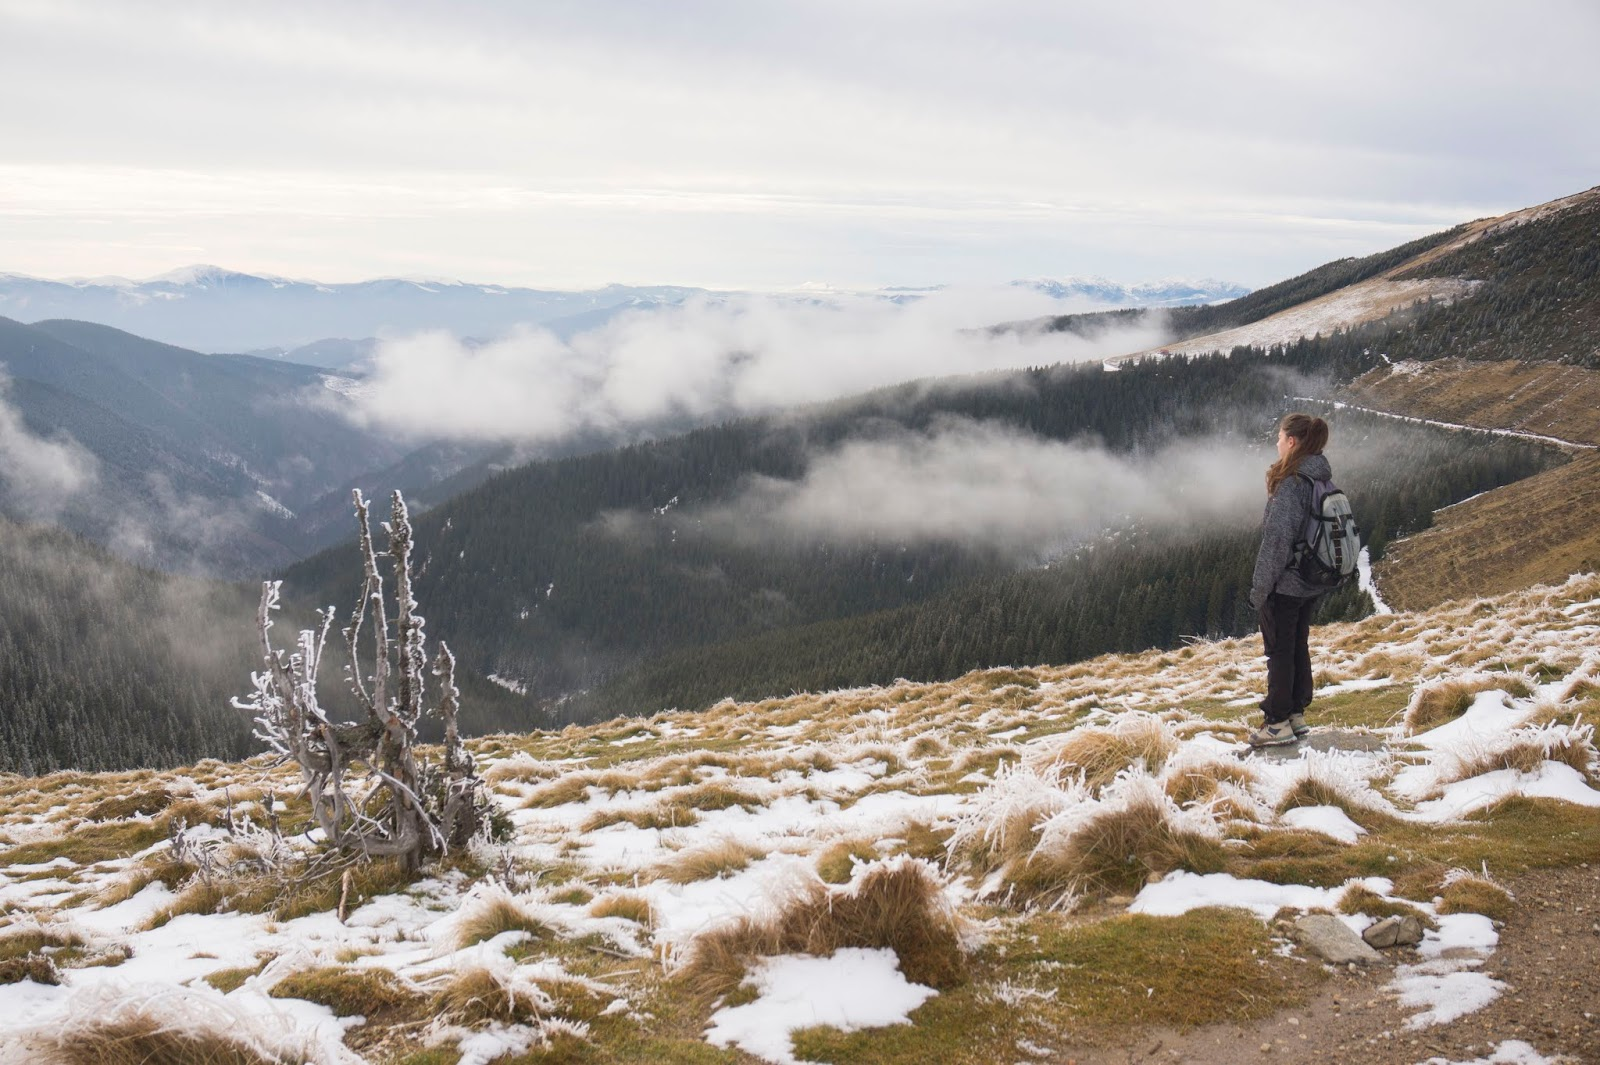 Poteca spre-varful-Sureanu-muntii-Sureanu - Alina Cirja